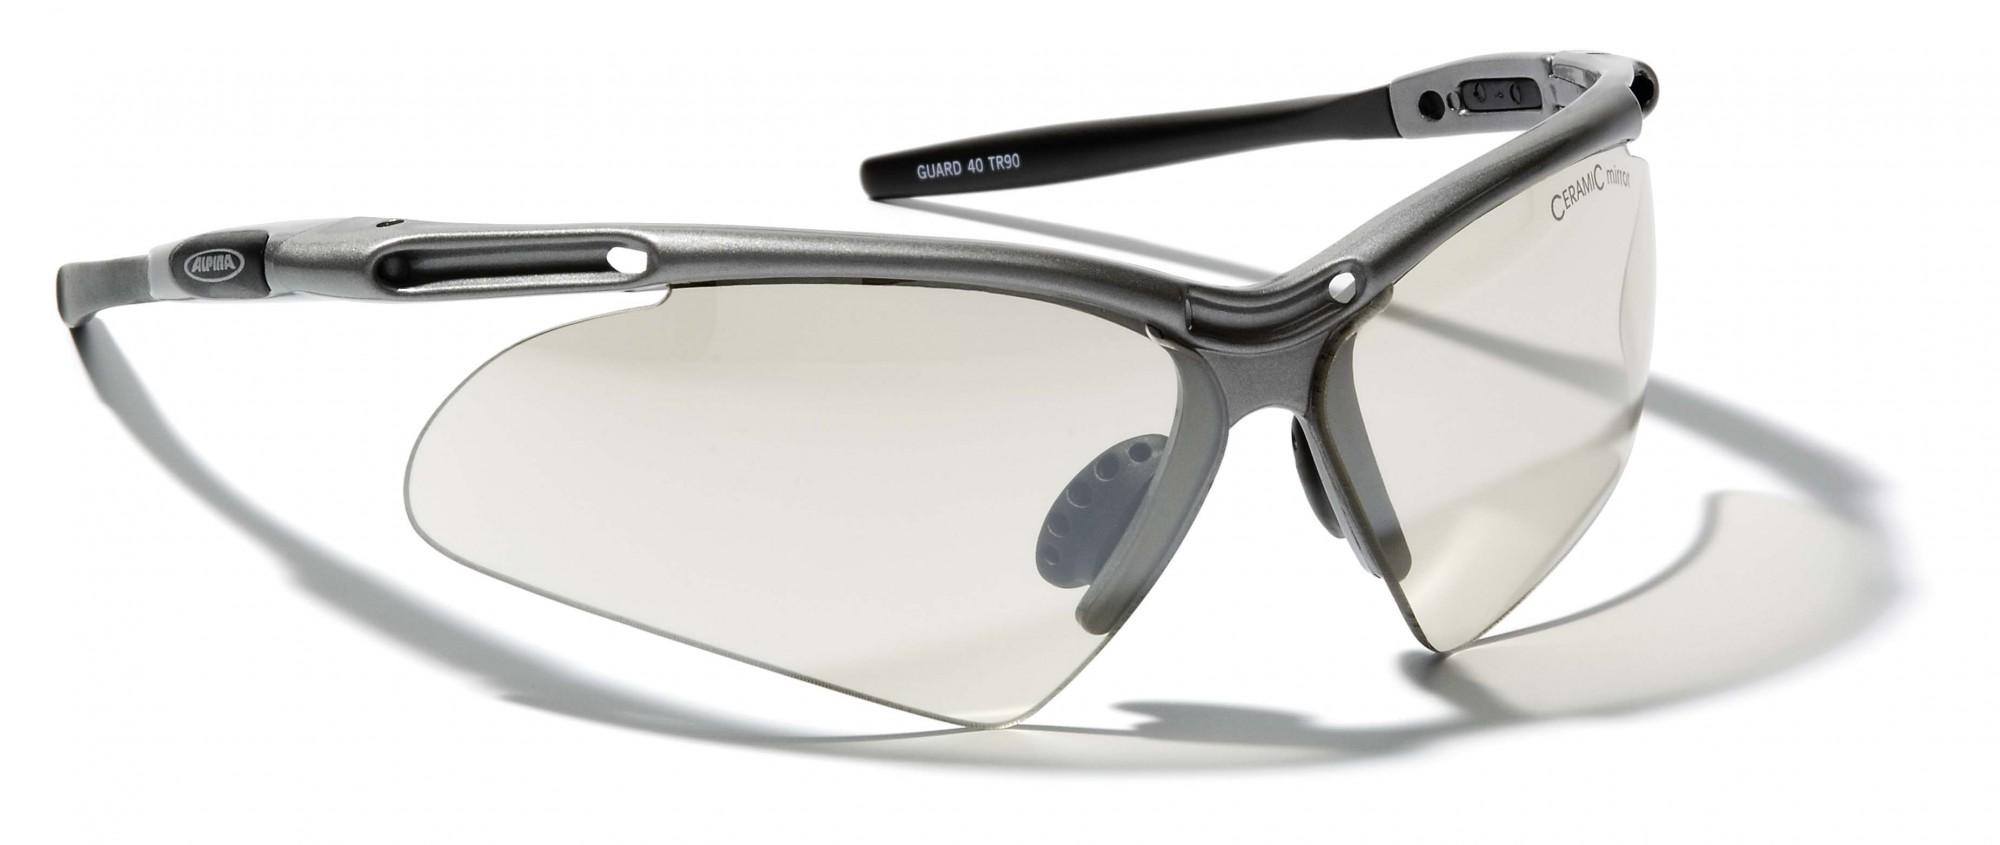 Sportbrille Alpina Guard 40 platin zinn amp; schwarz randlose Brille ...